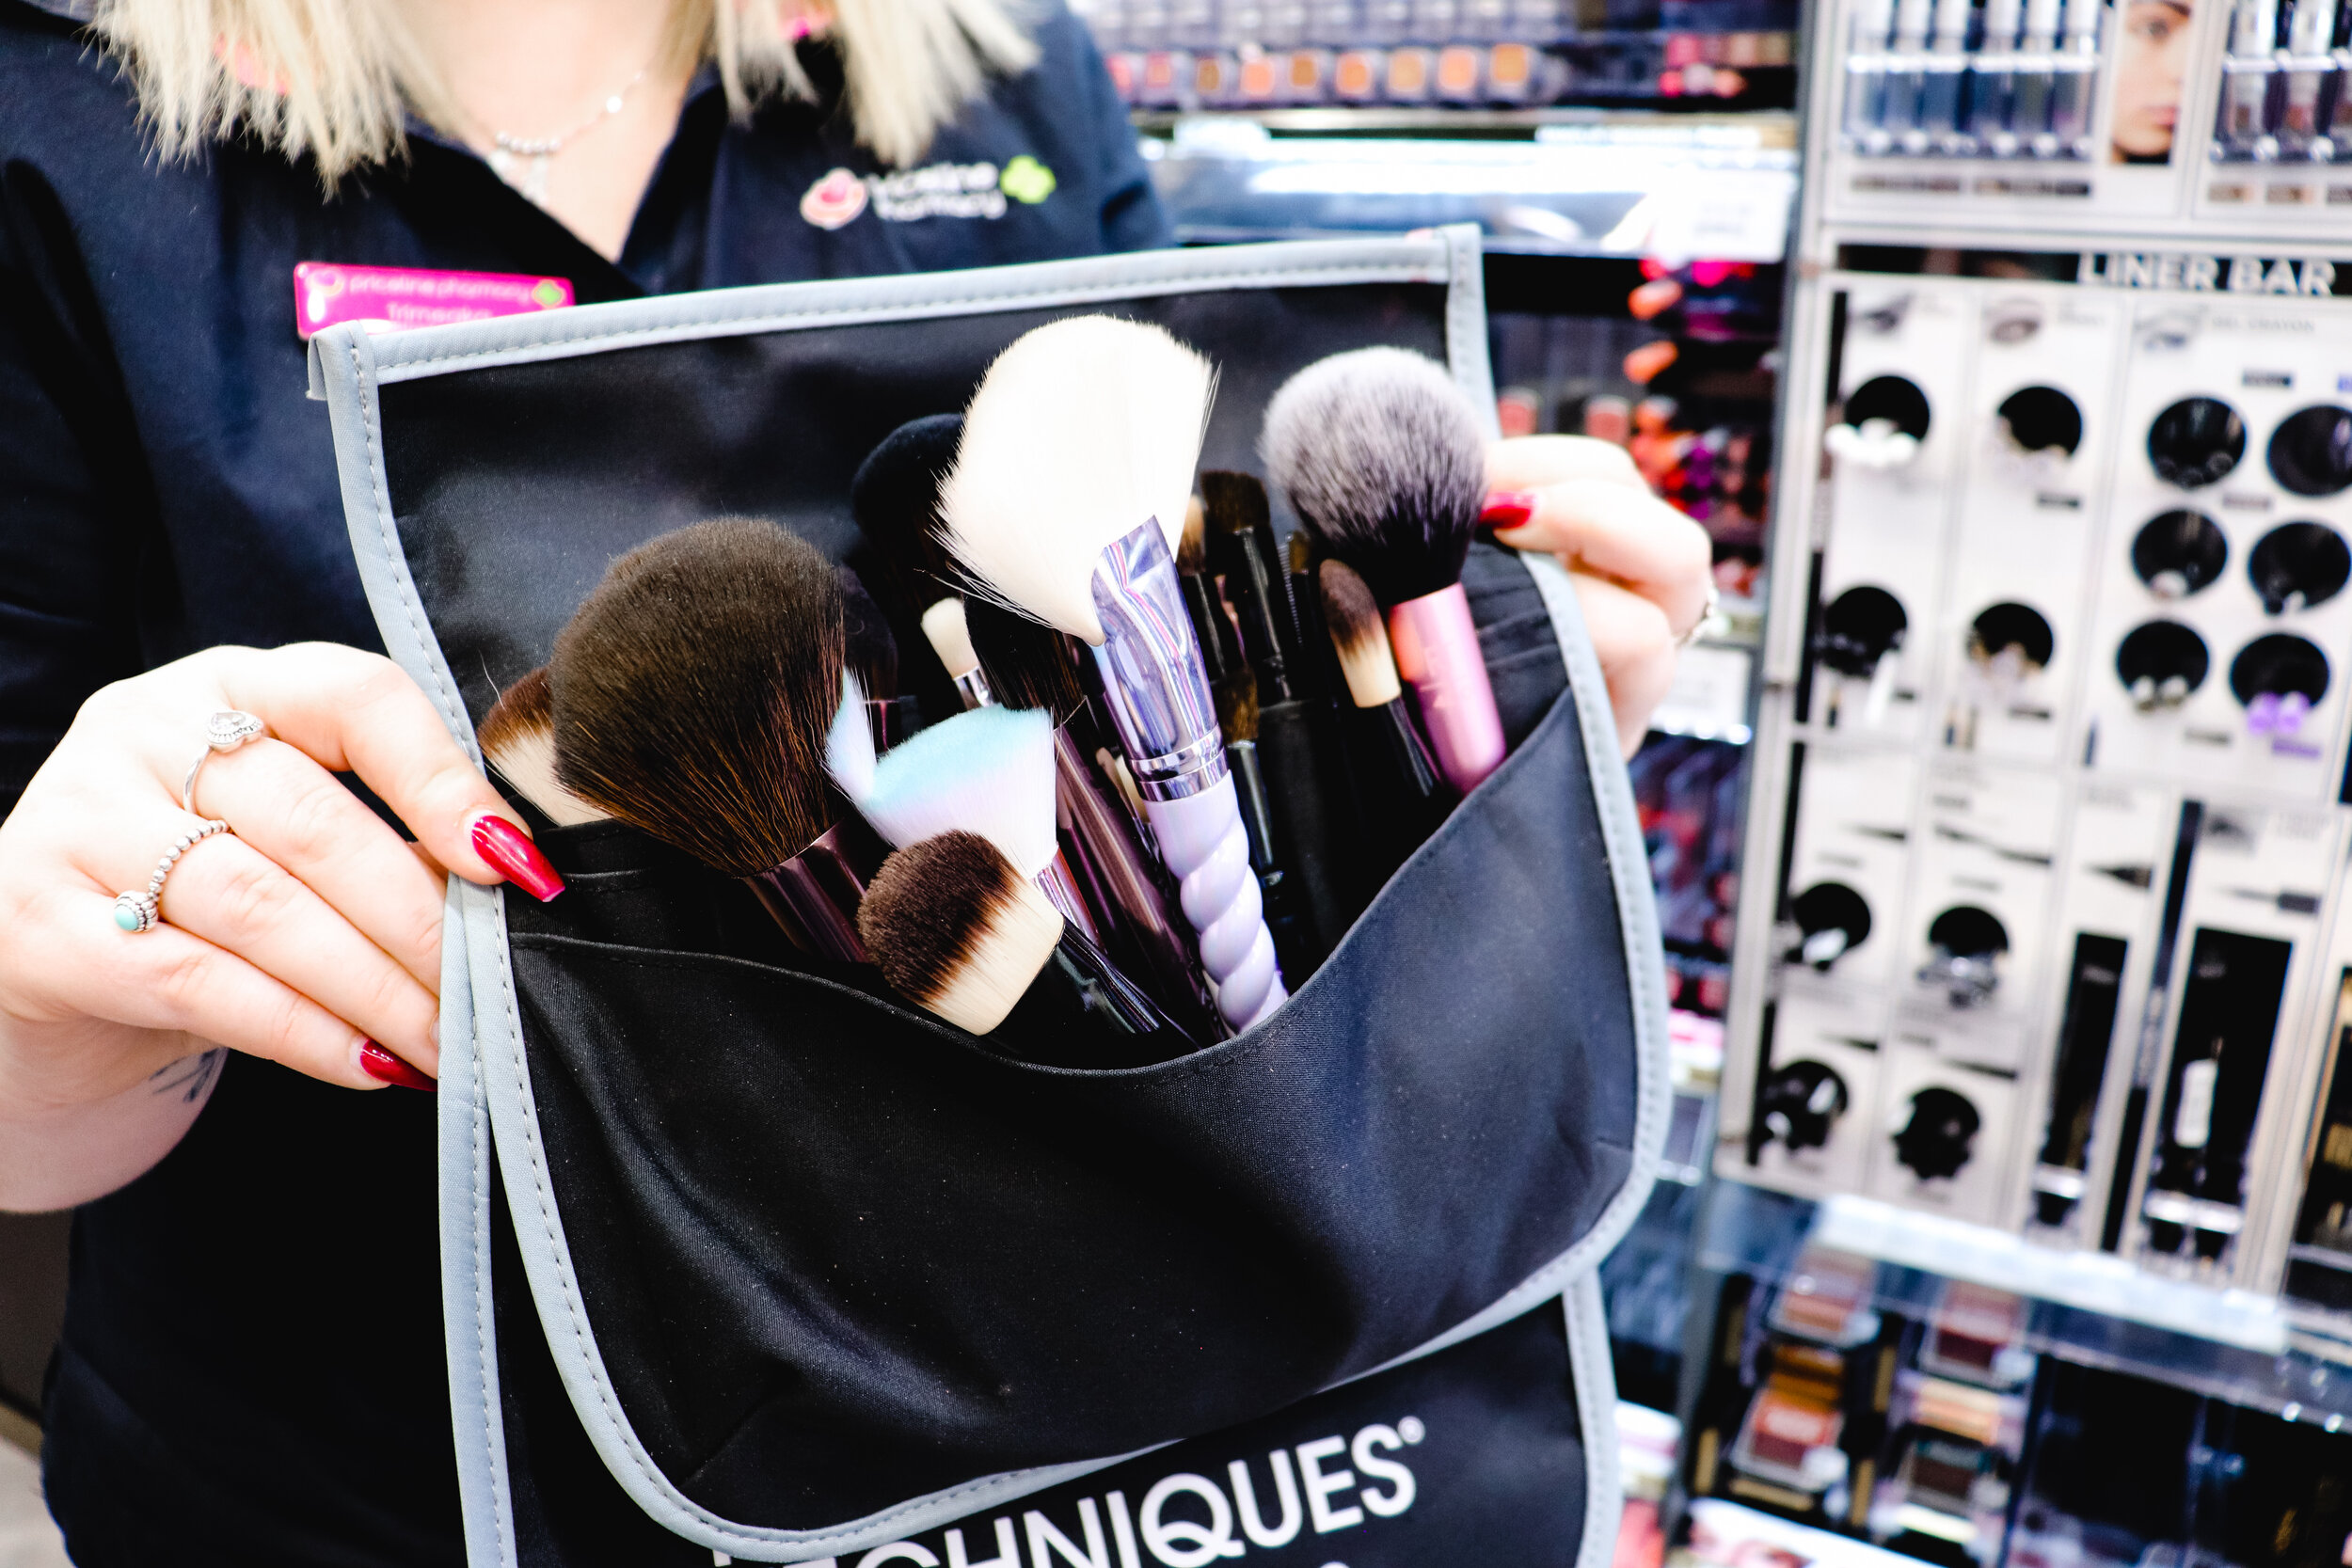 Ingleburn_Village_Priceline_Makeup.jpg